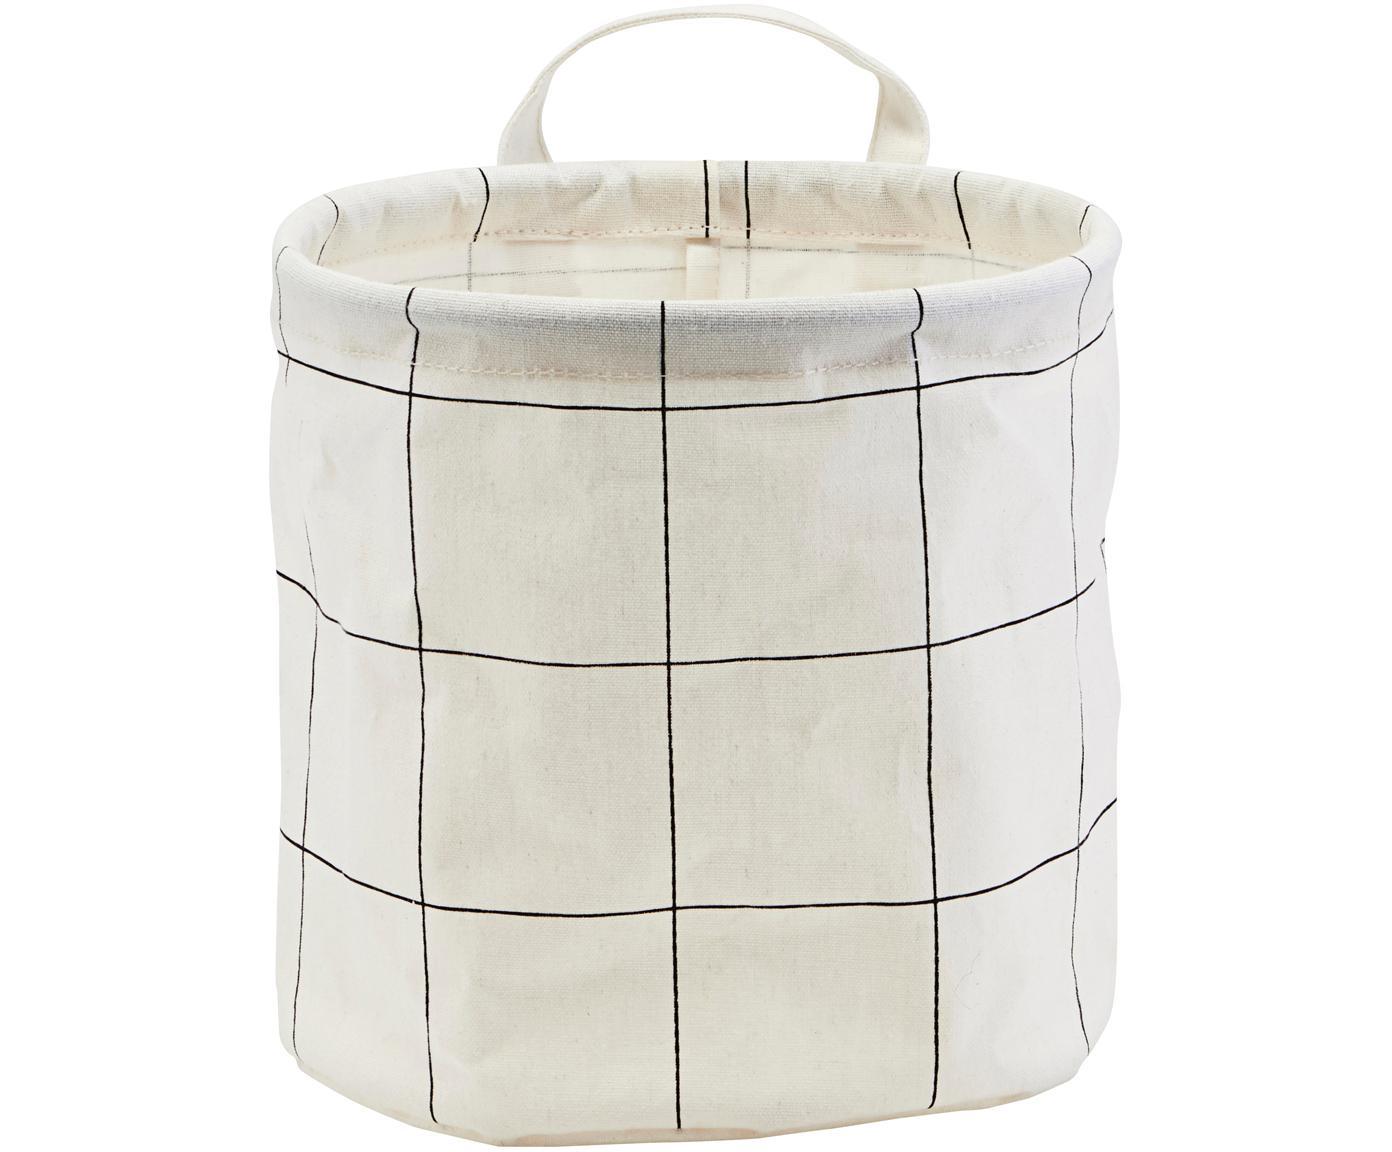 Opbergmand Squares, 38%katoen, 40%polyester, 22%rayon, Wit, zwart, Ø 20 x H 20 cm